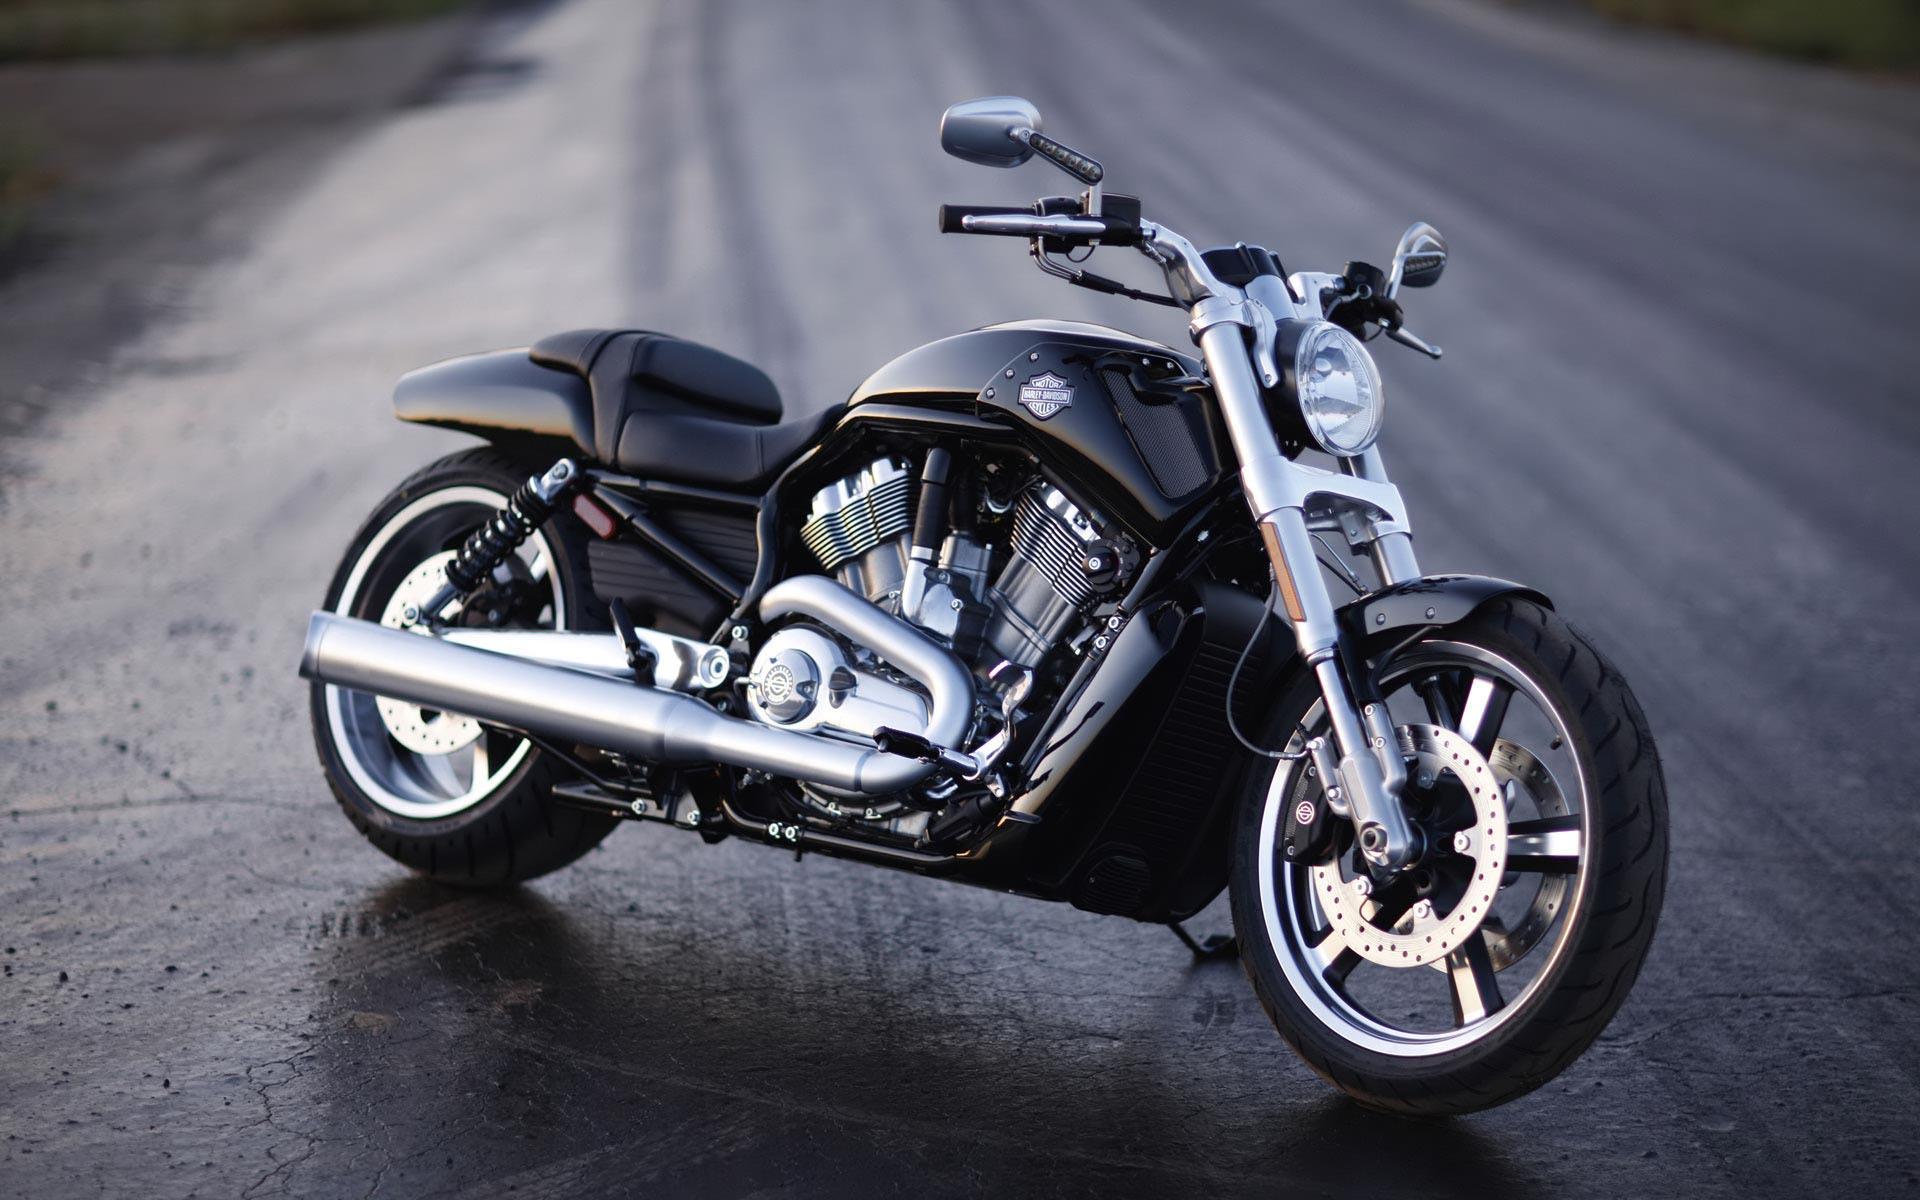 Desktop backgrounds Motors Bikes Harley Davidson motorcycle 1920x1200